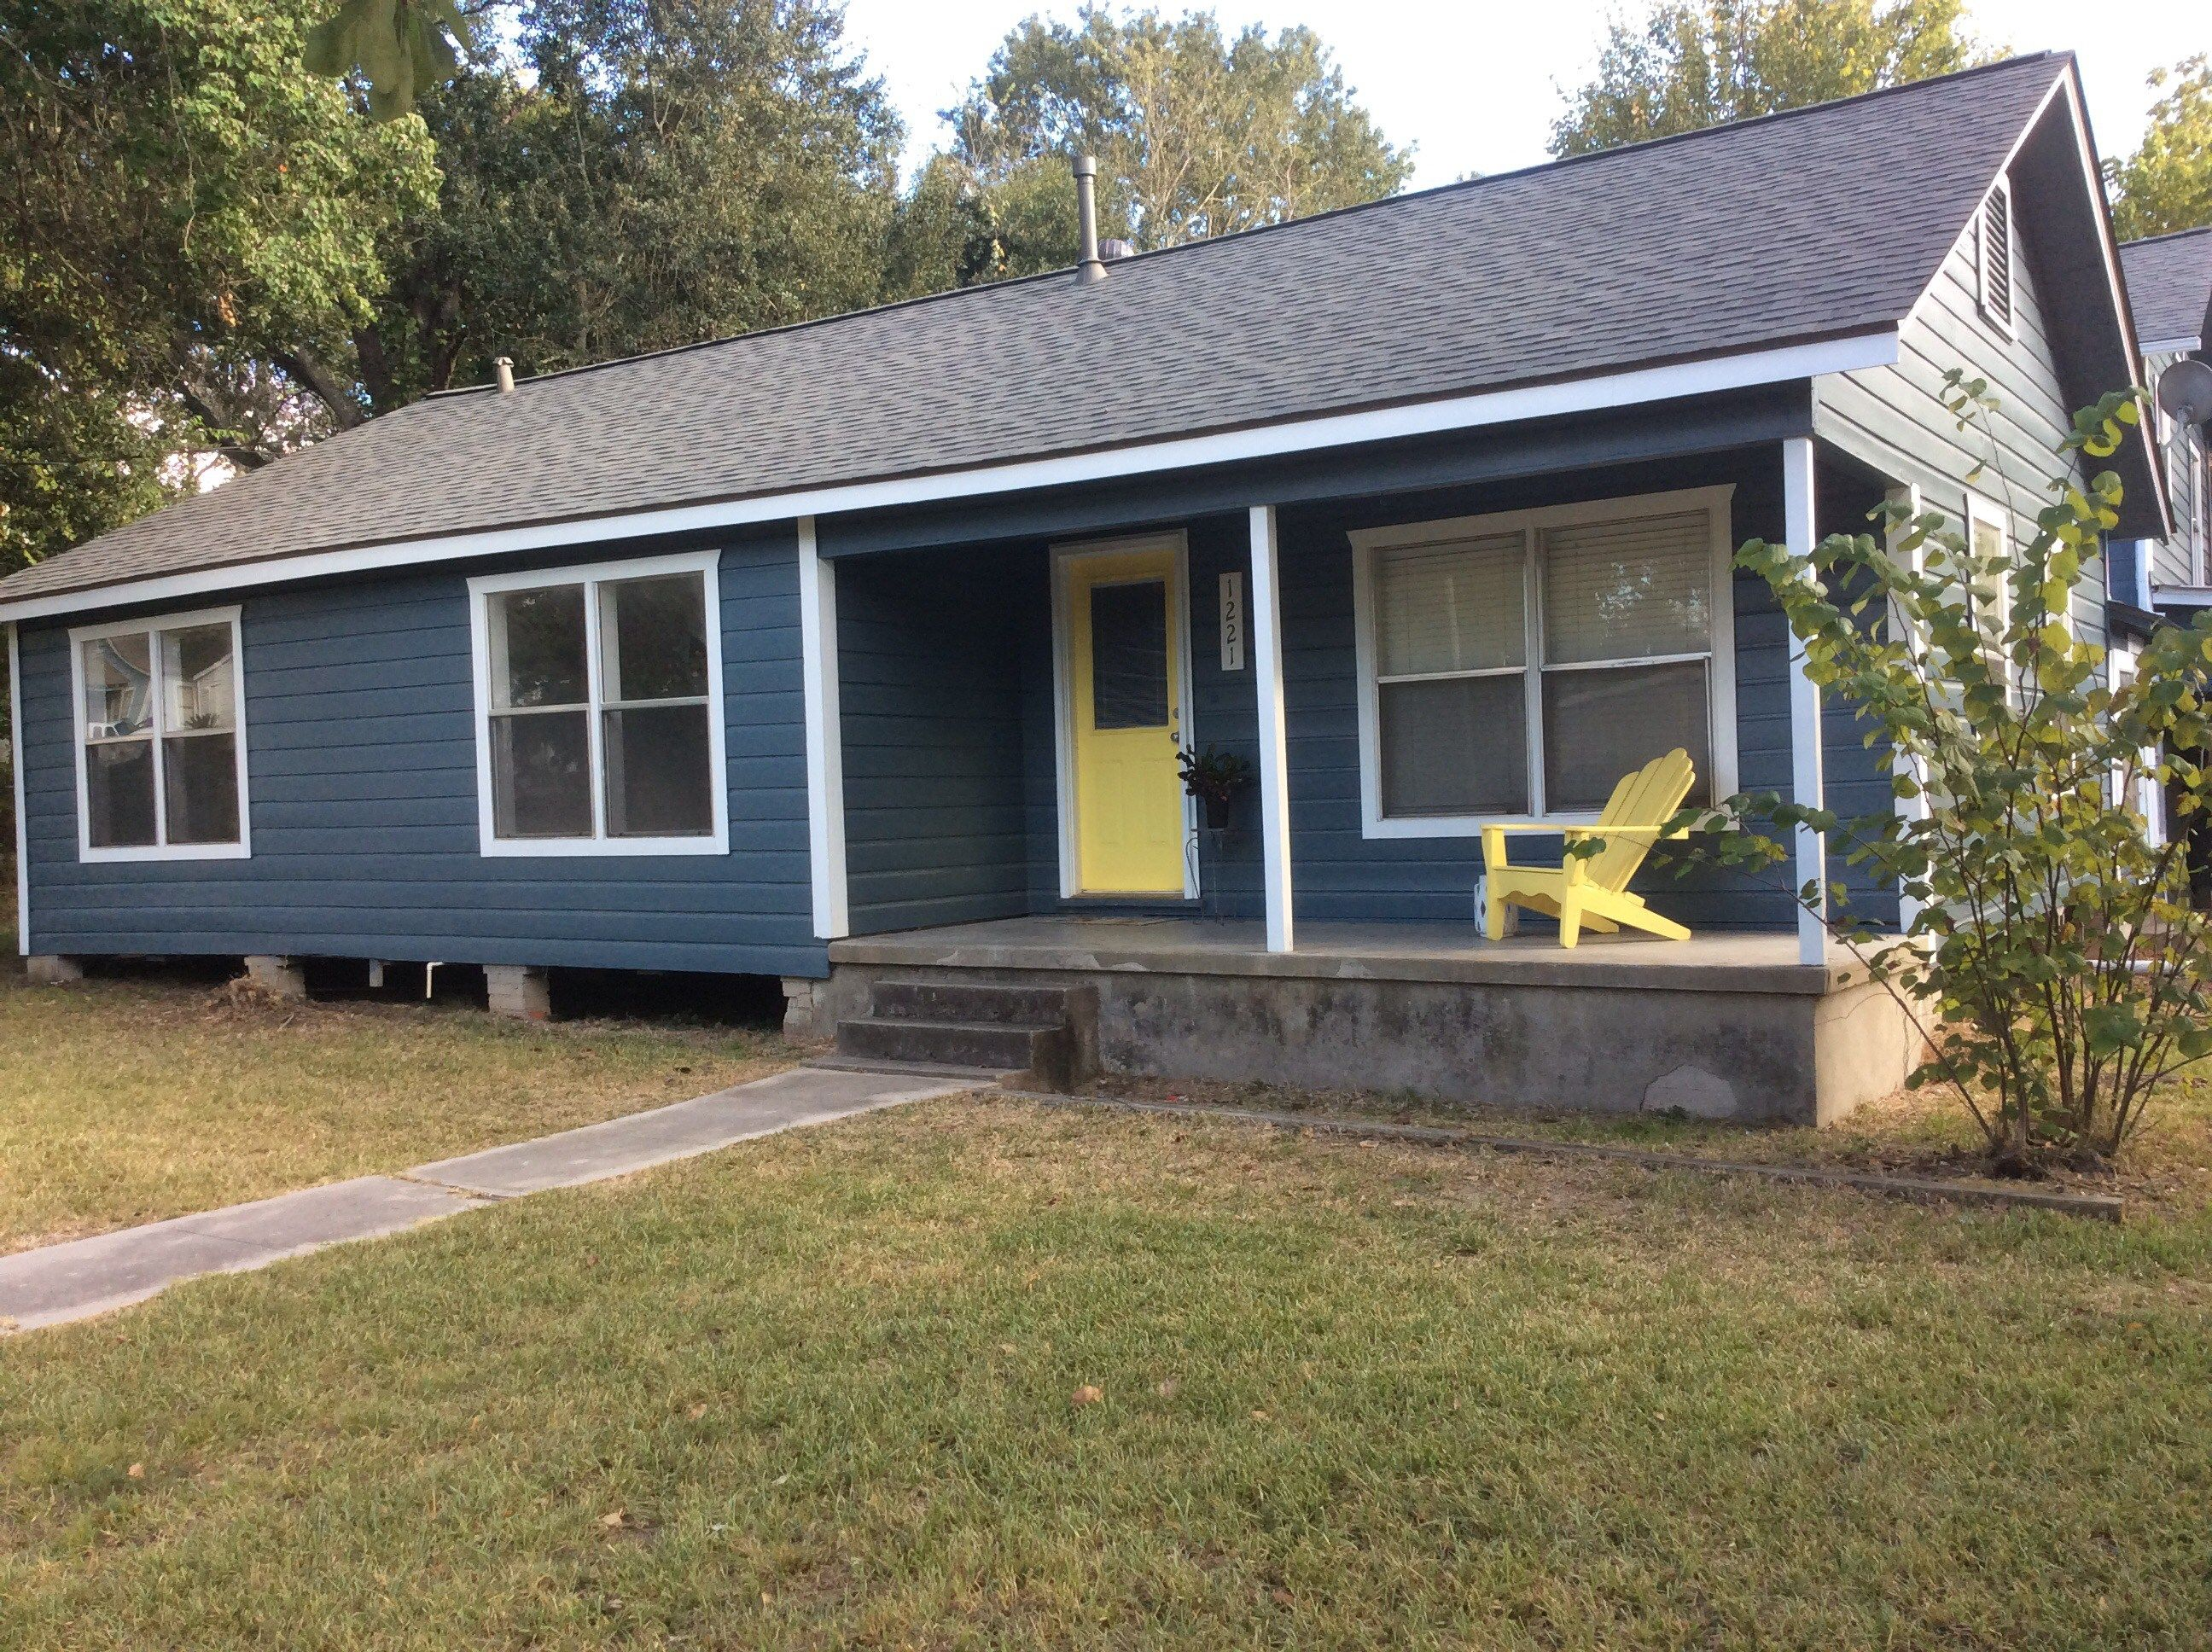 Sw Slate Tile Exterior House Color House Exterior House Colors